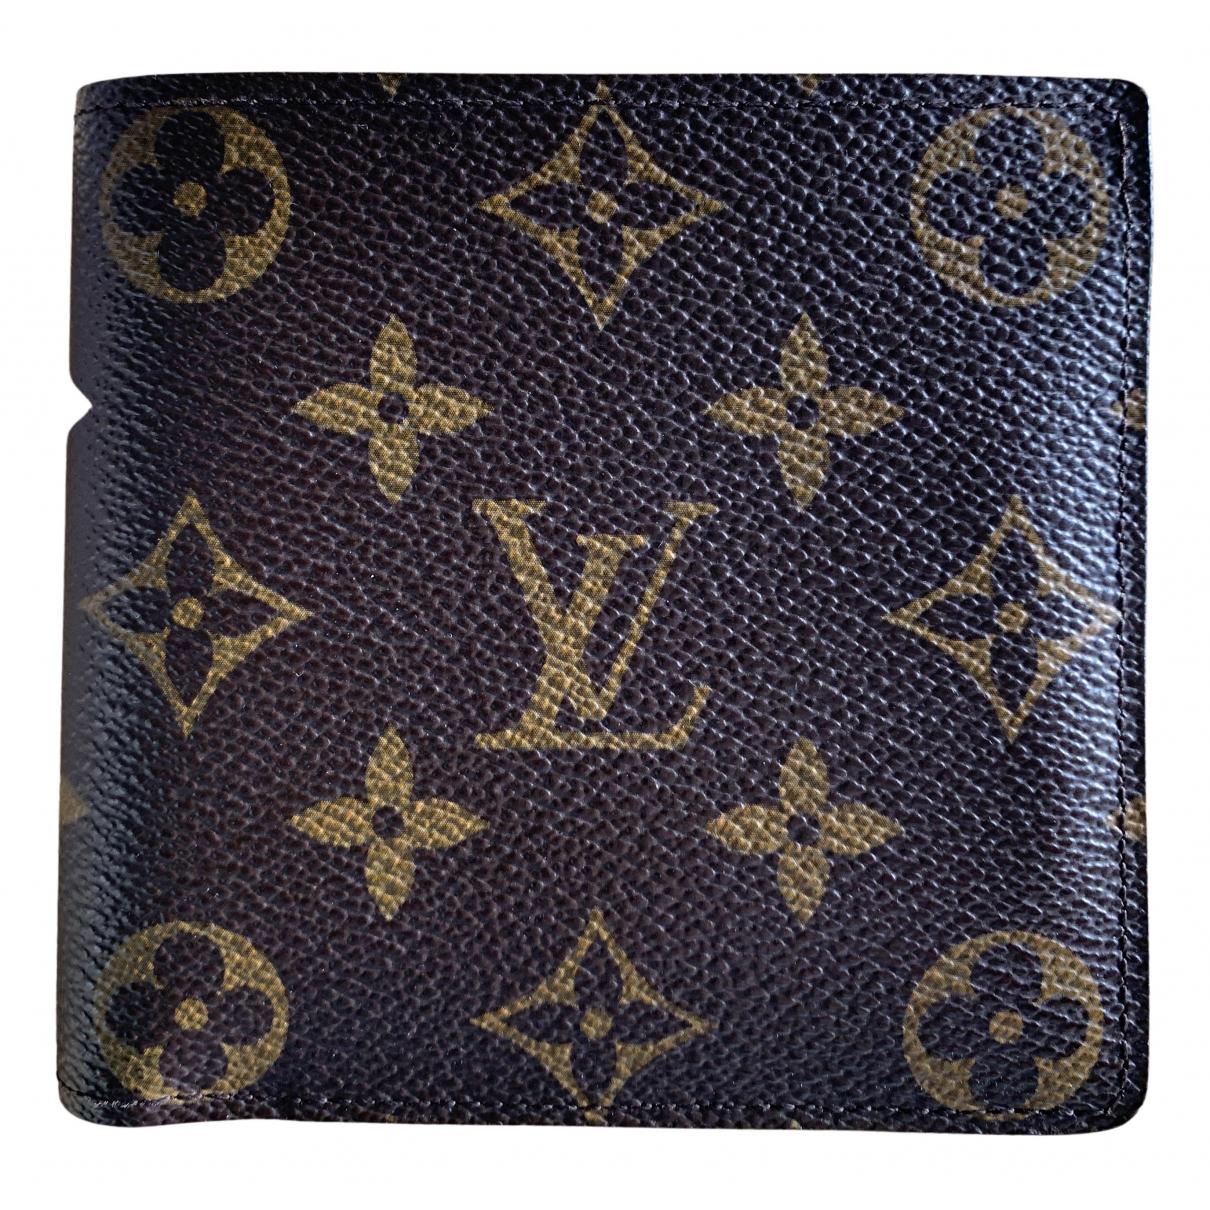 Marroquineria Marco de Lona Louis Vuitton